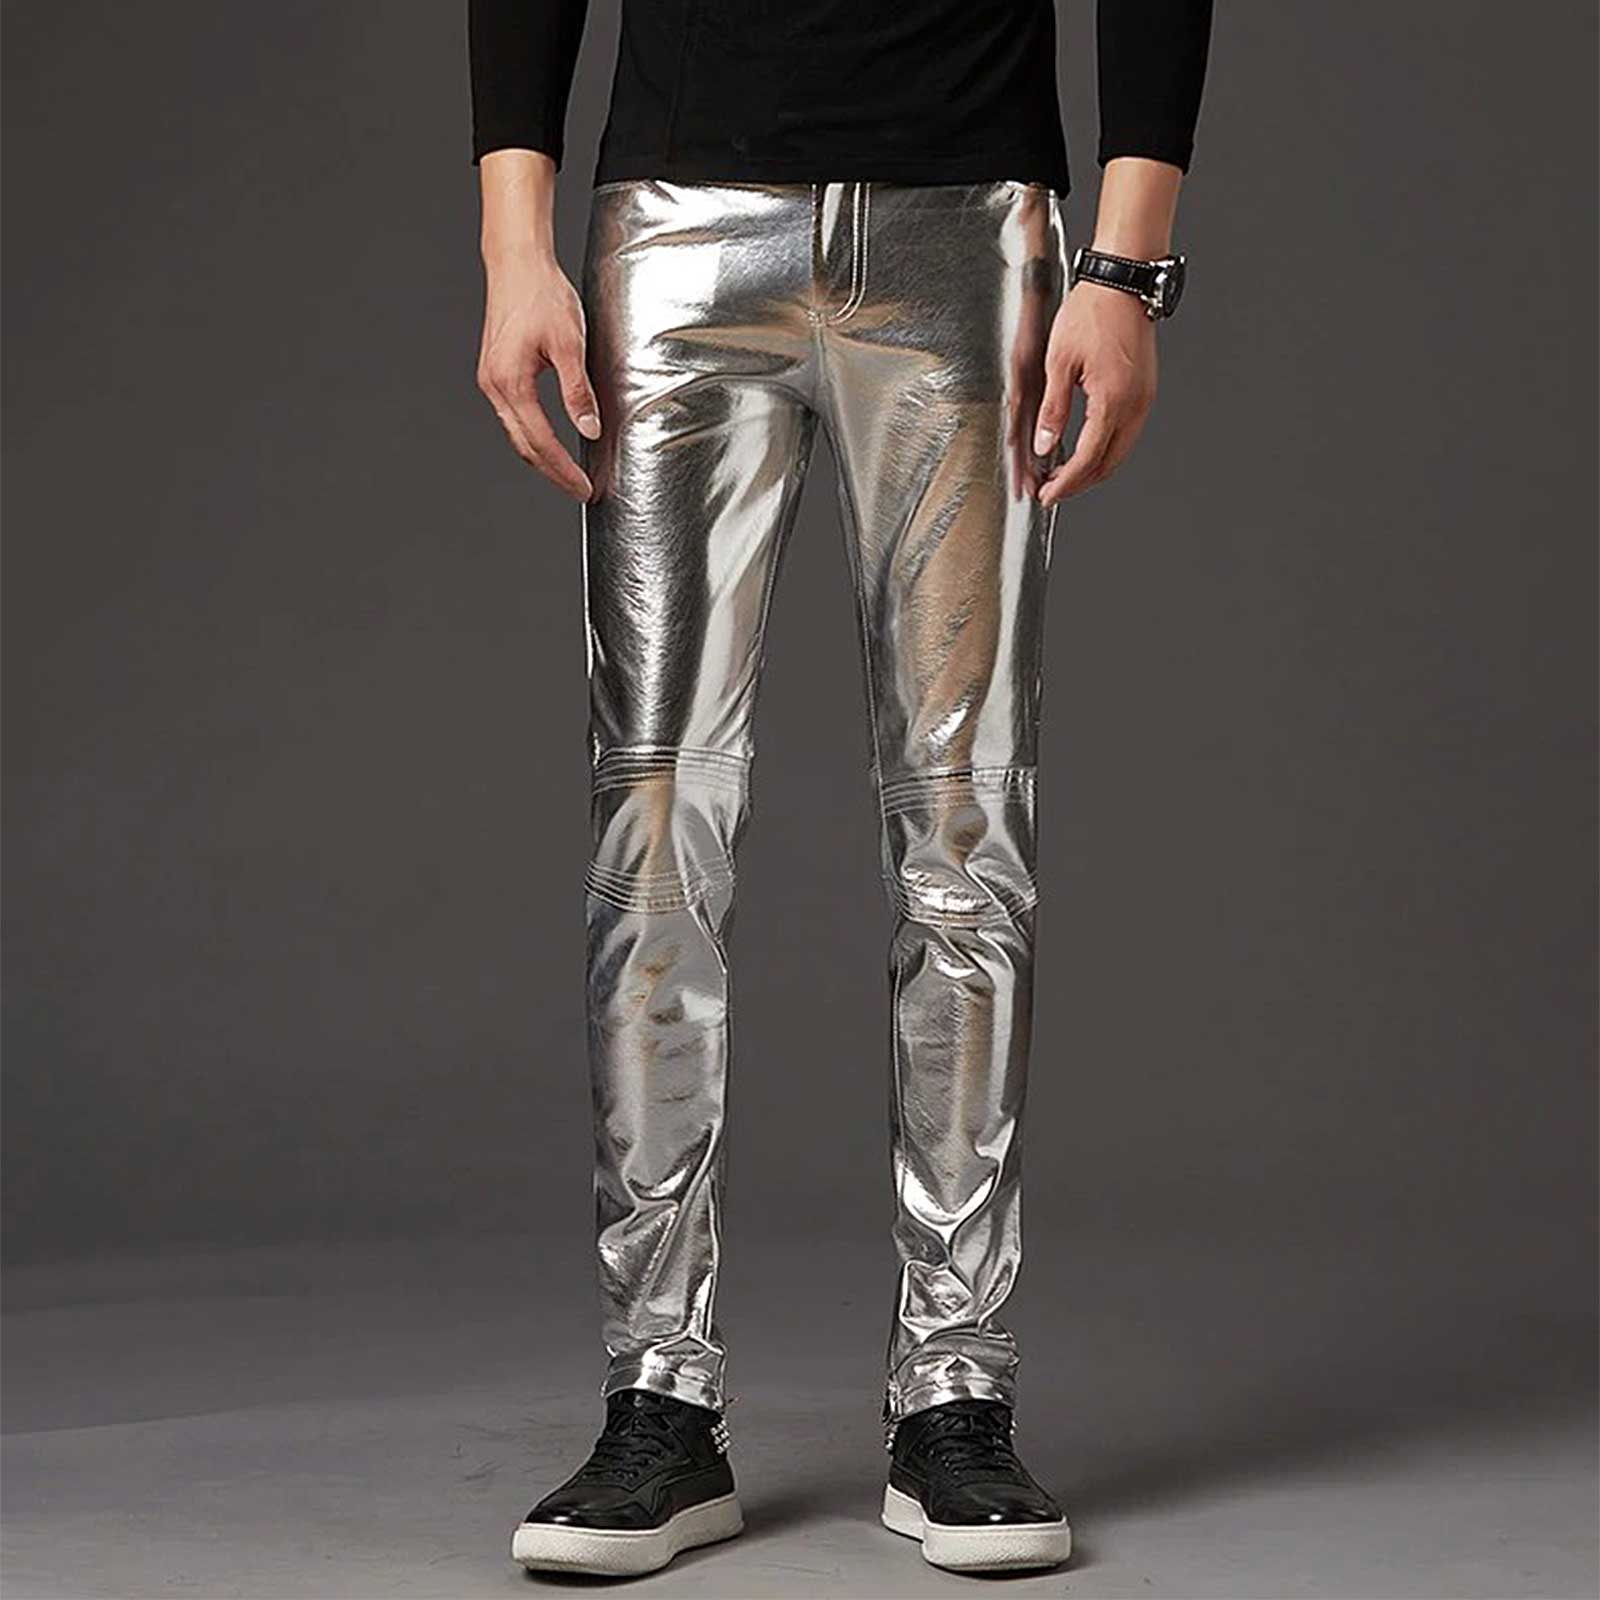 Silverstar Pants